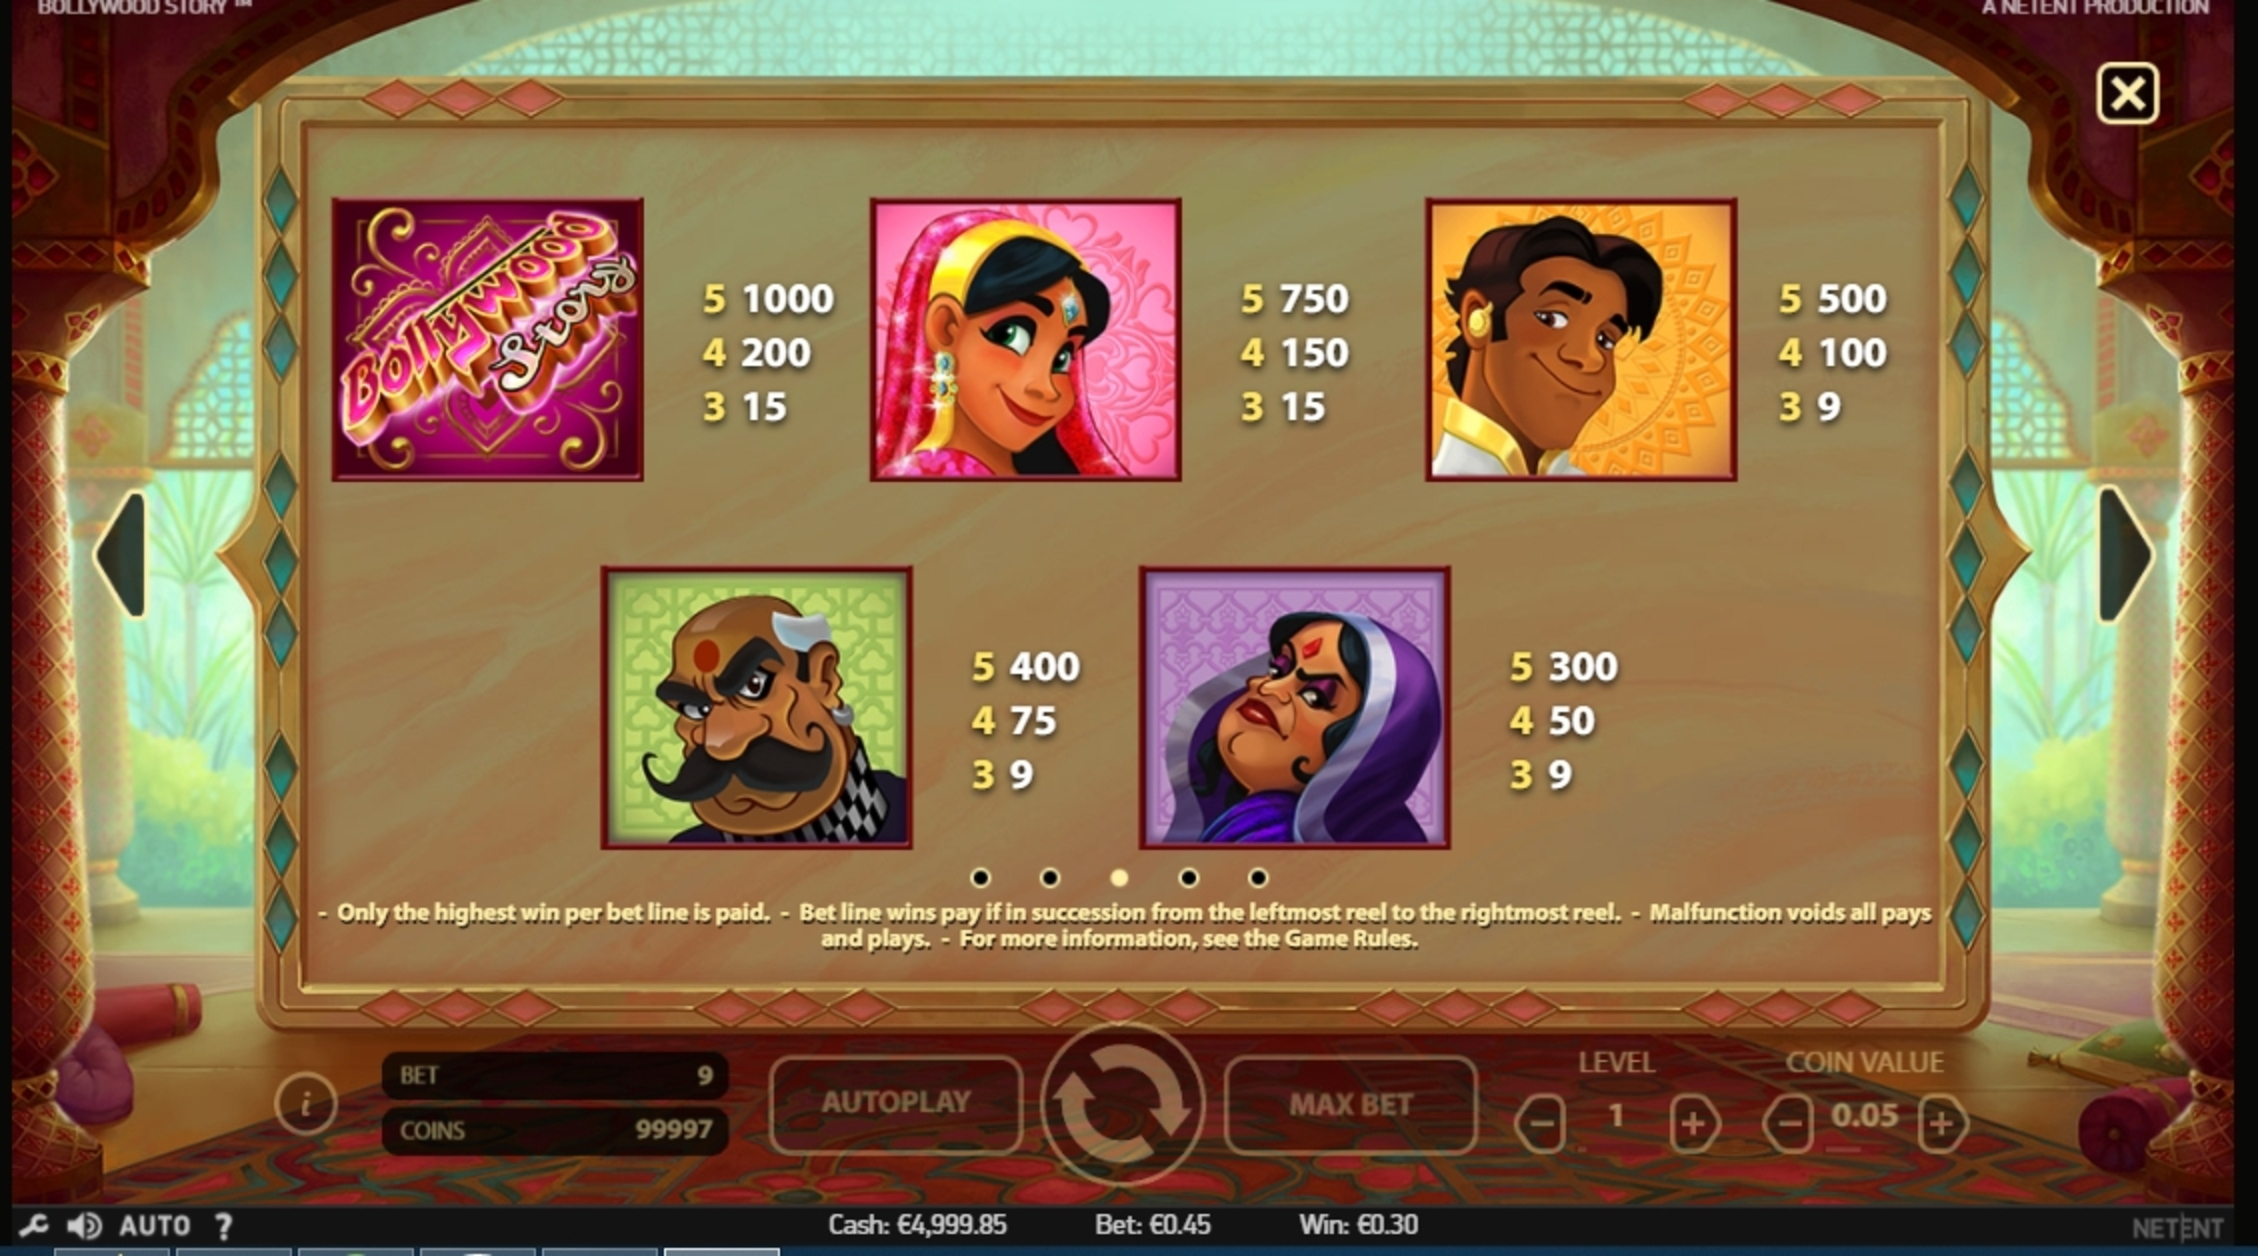 Lar?bollywood story netent slot game houston